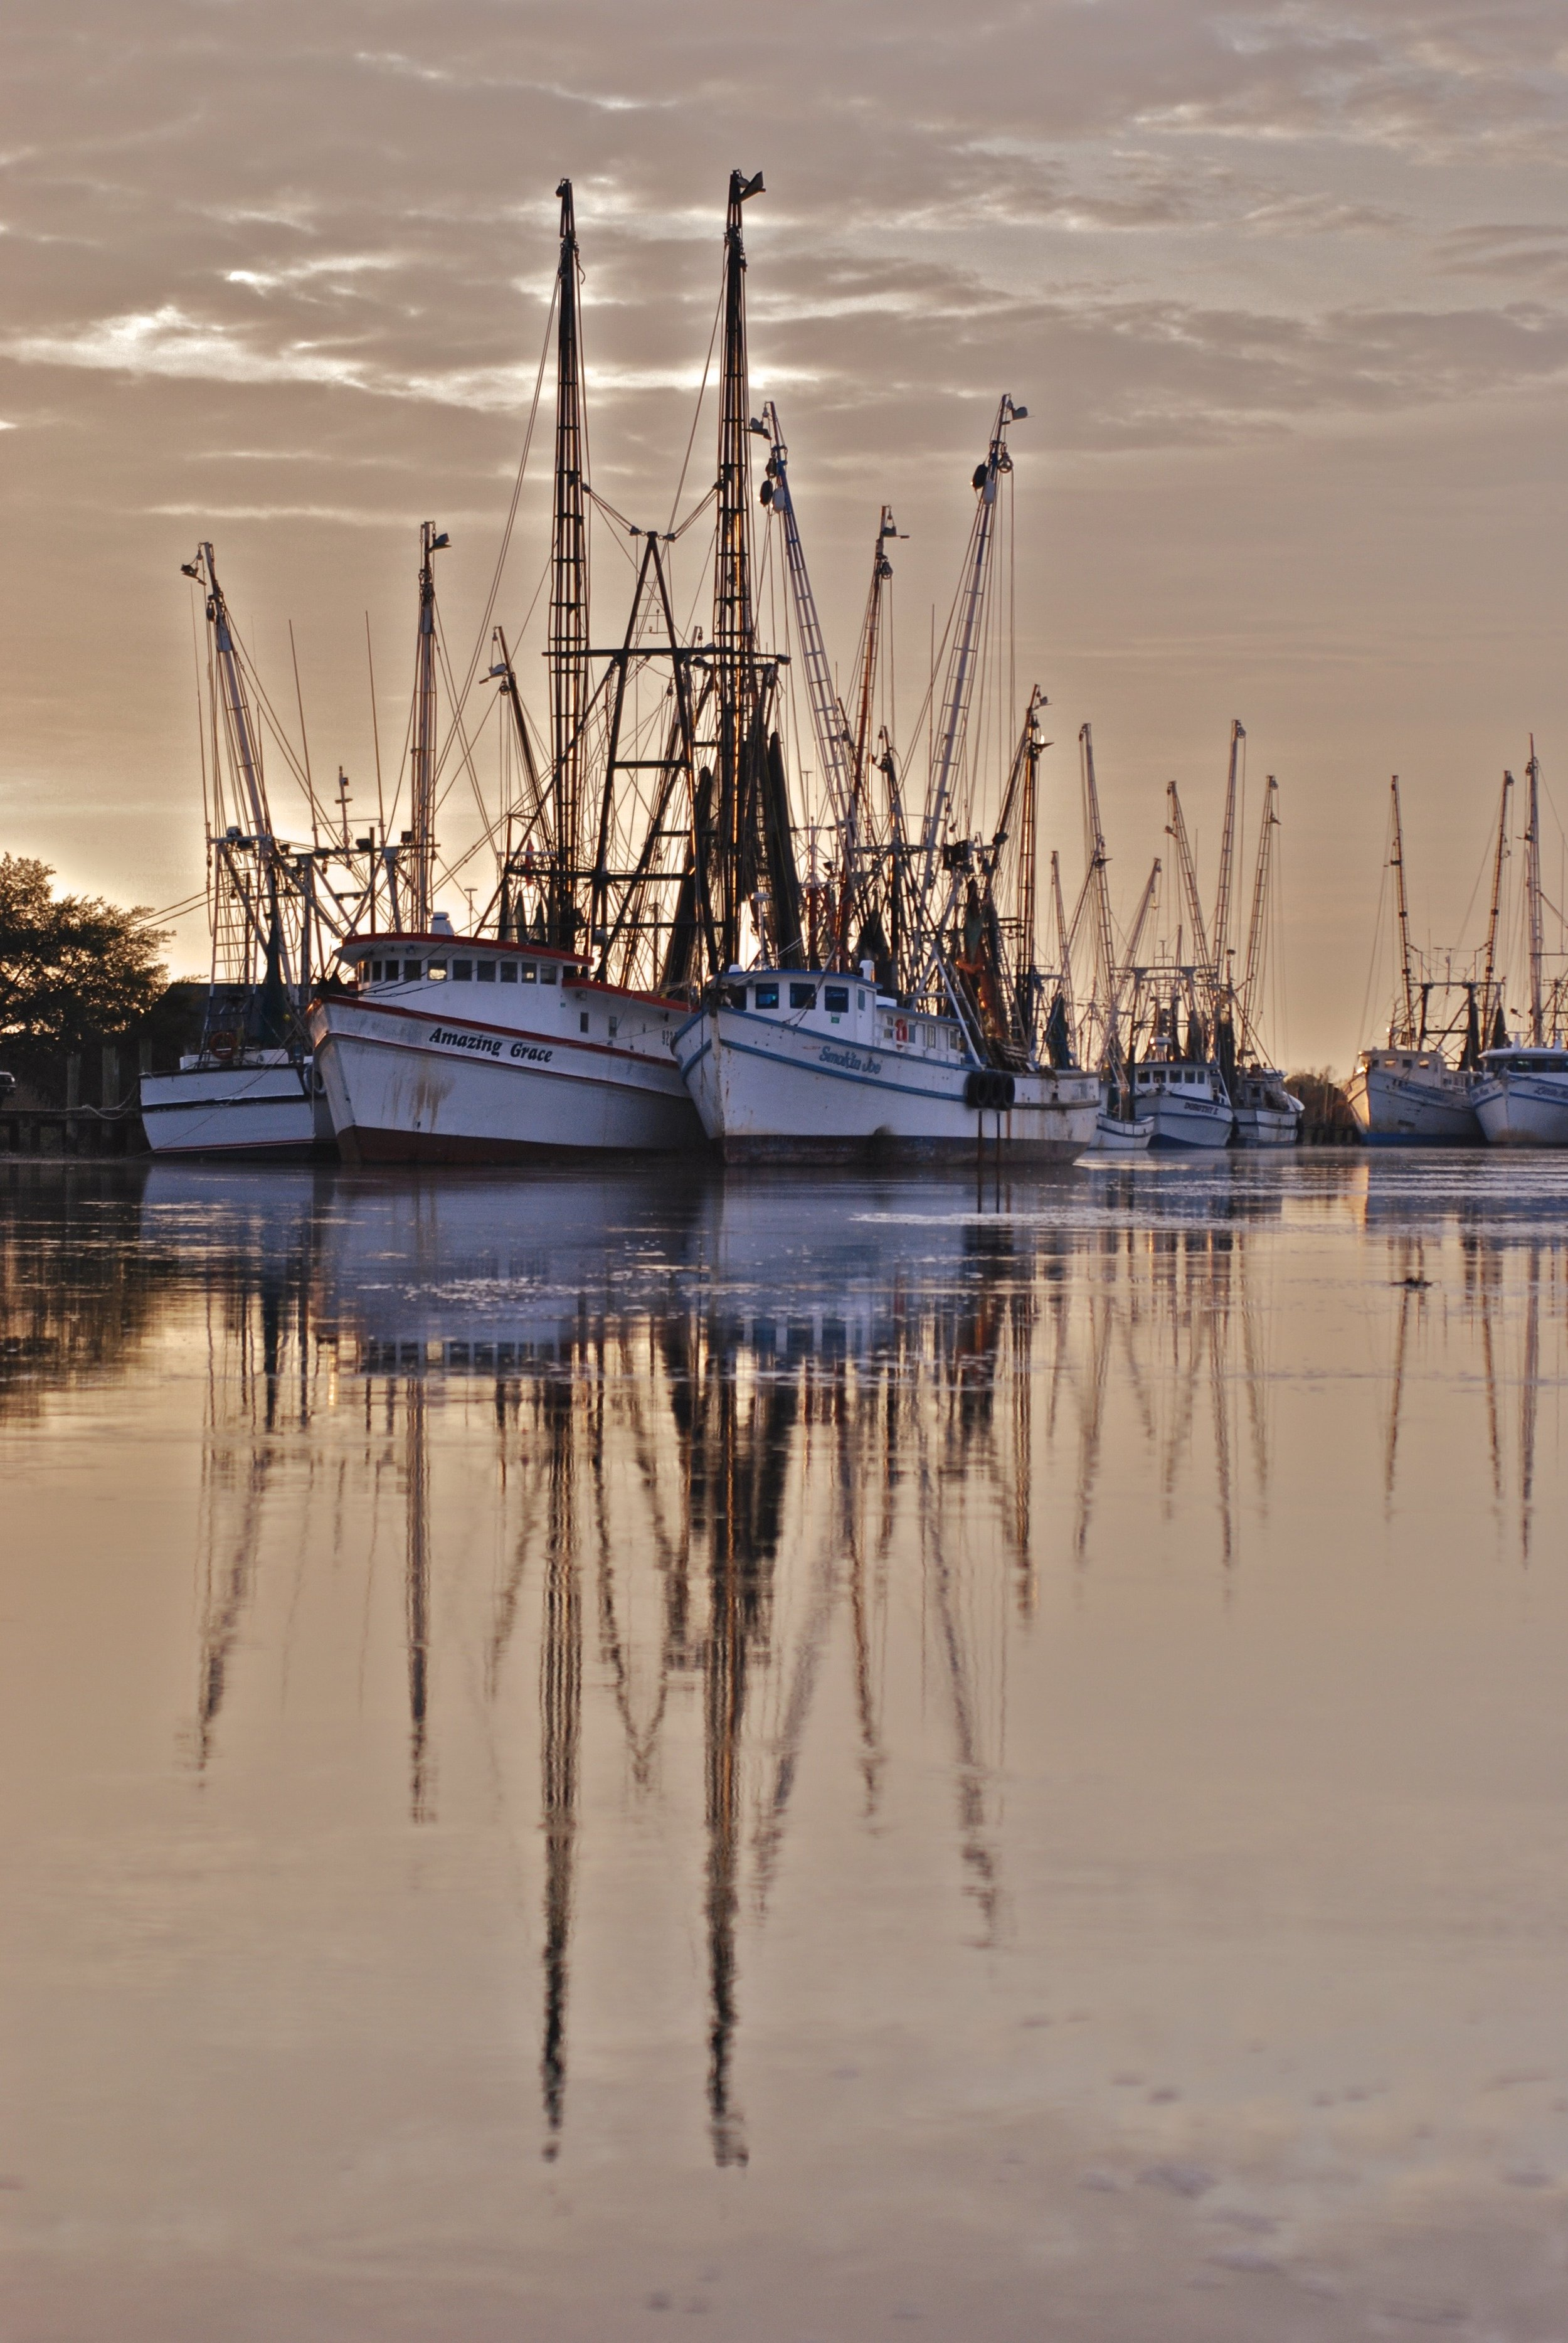 Here's the original from Darien, GA waterfront